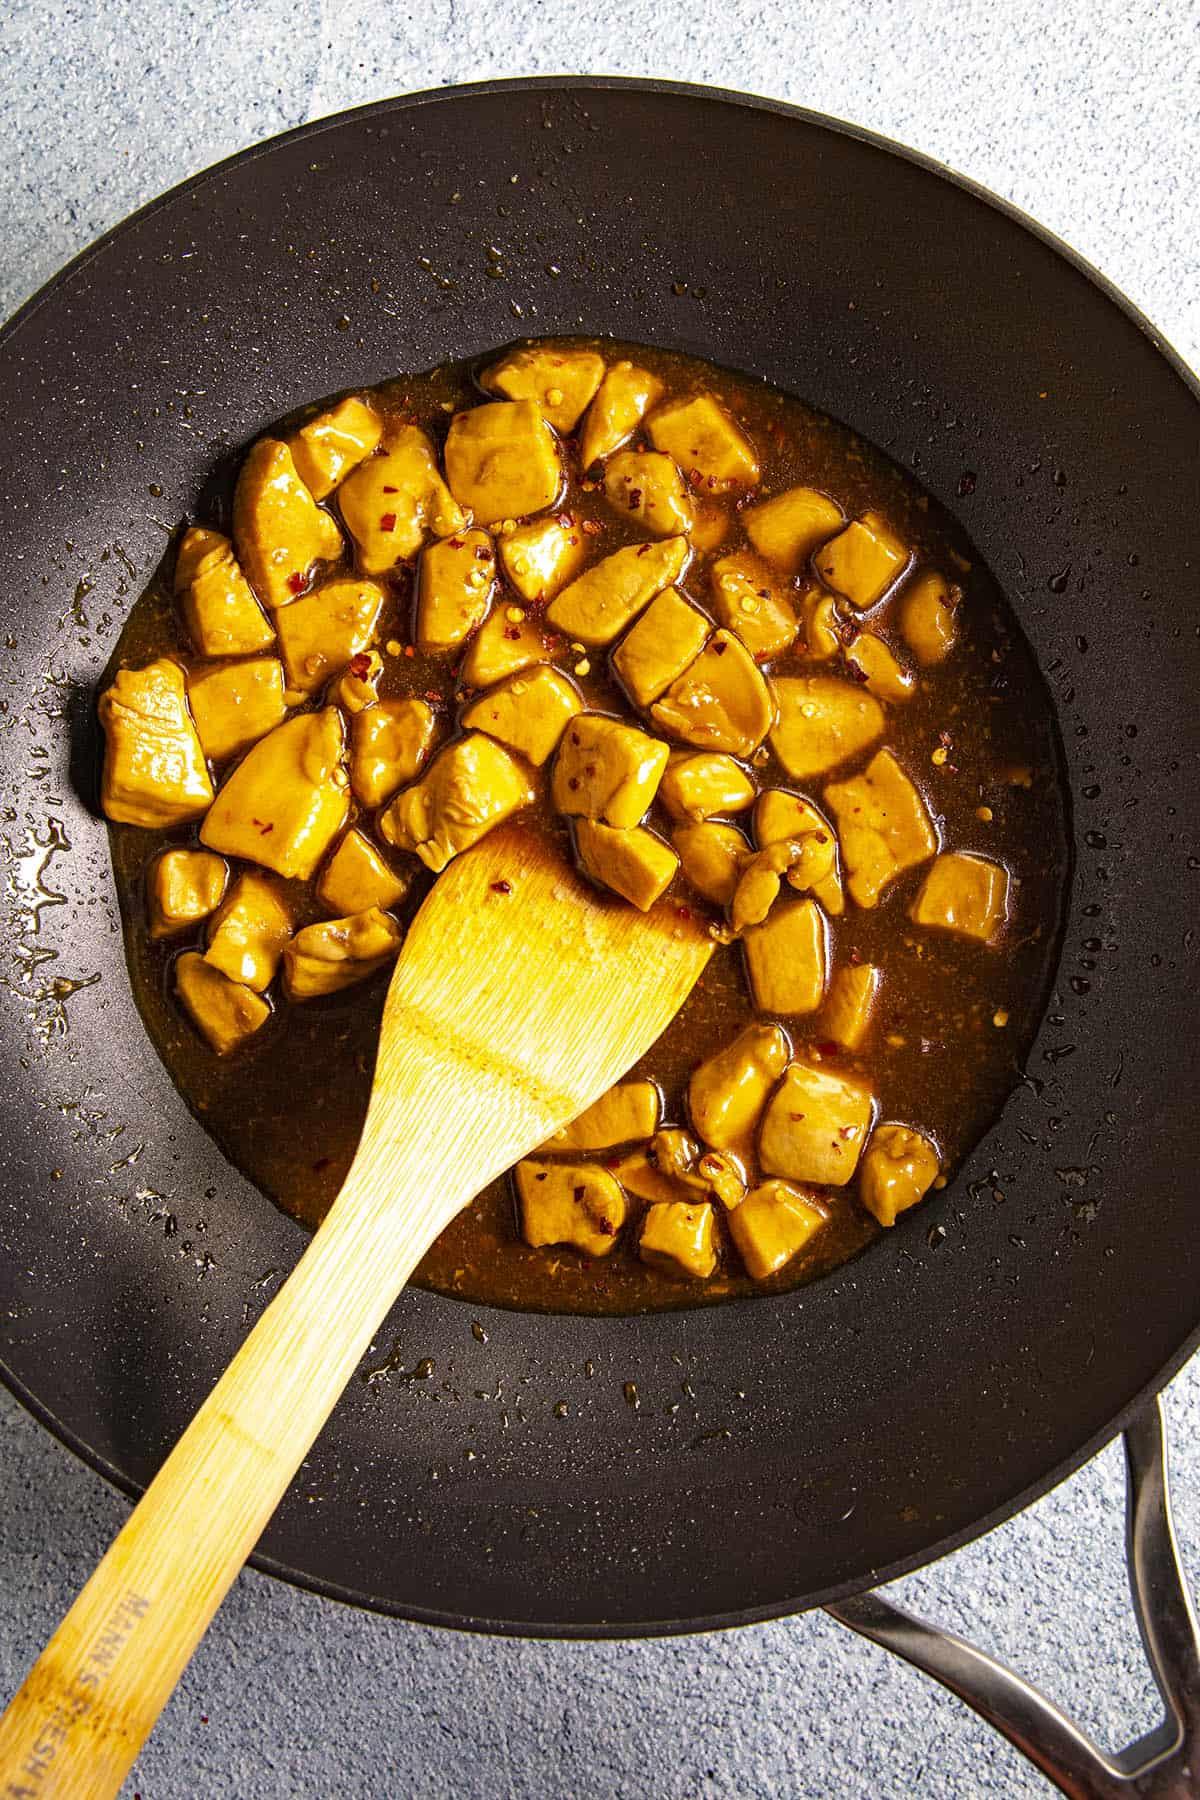 Thickening the Bourbon Chicken sauce in the wok